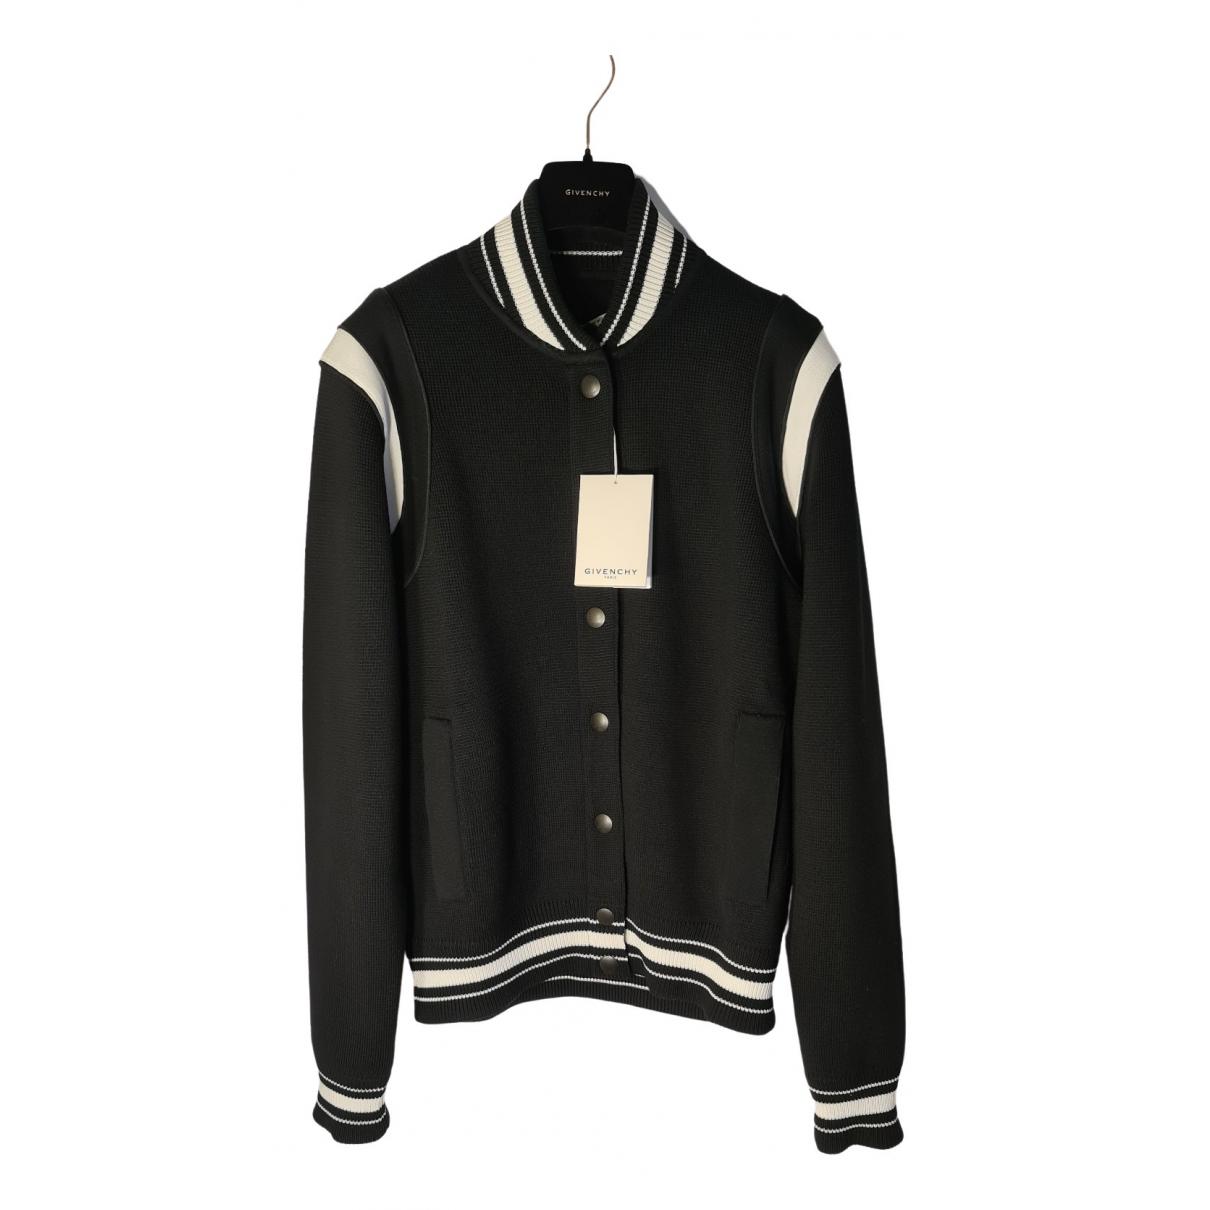 Givenchy \N Jacke in  Schwarz Wolle